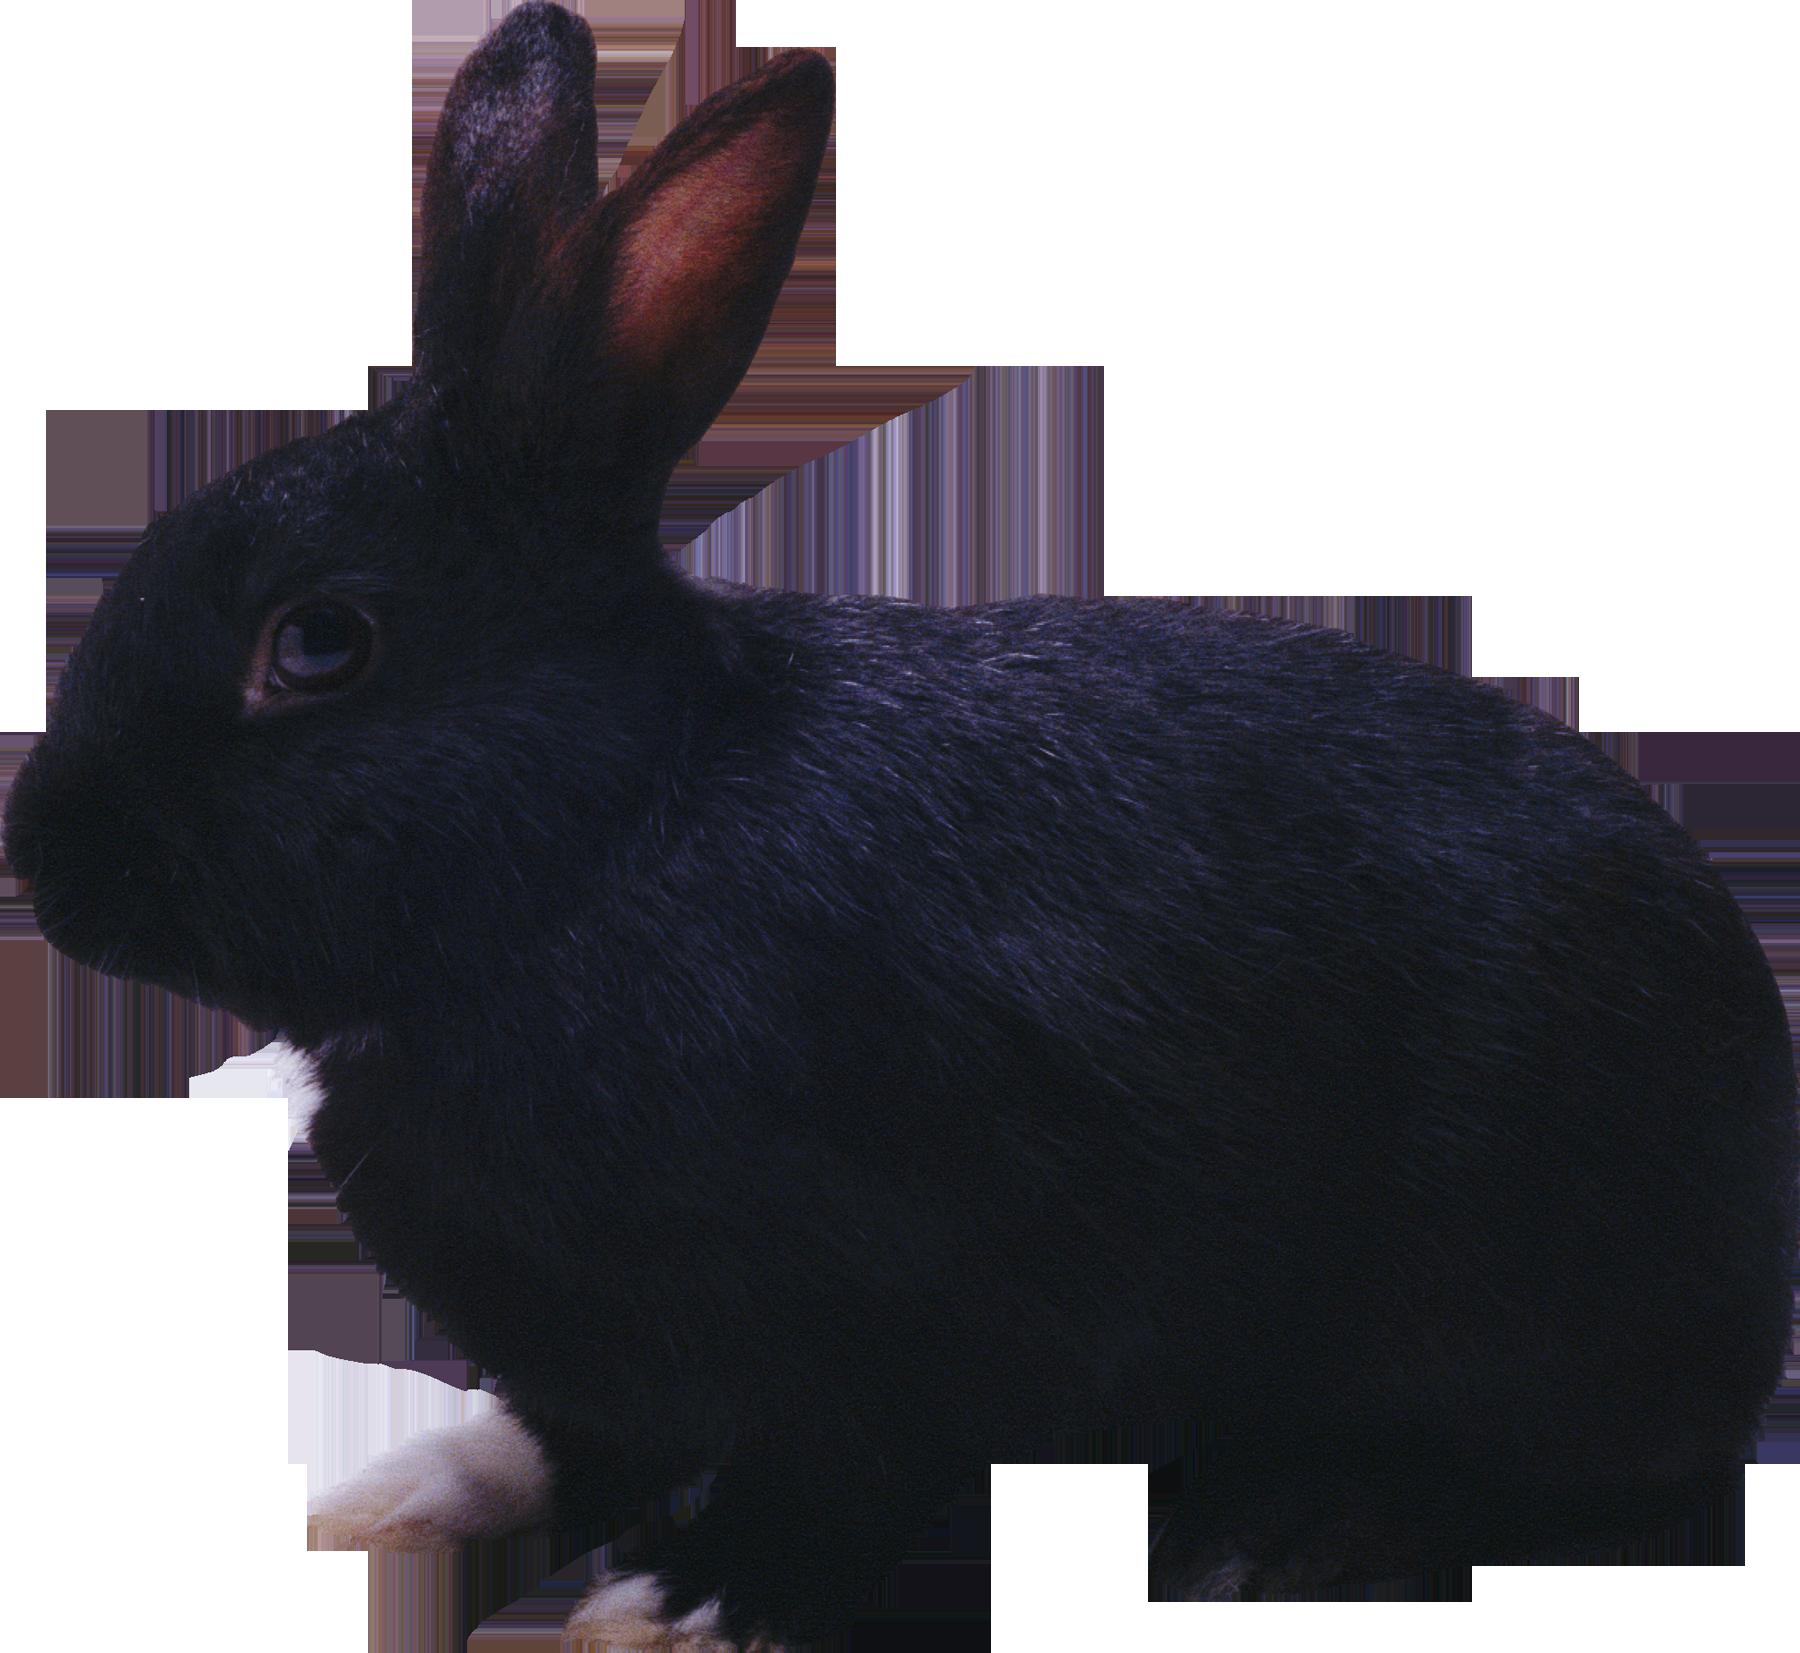 Заяц фото черный